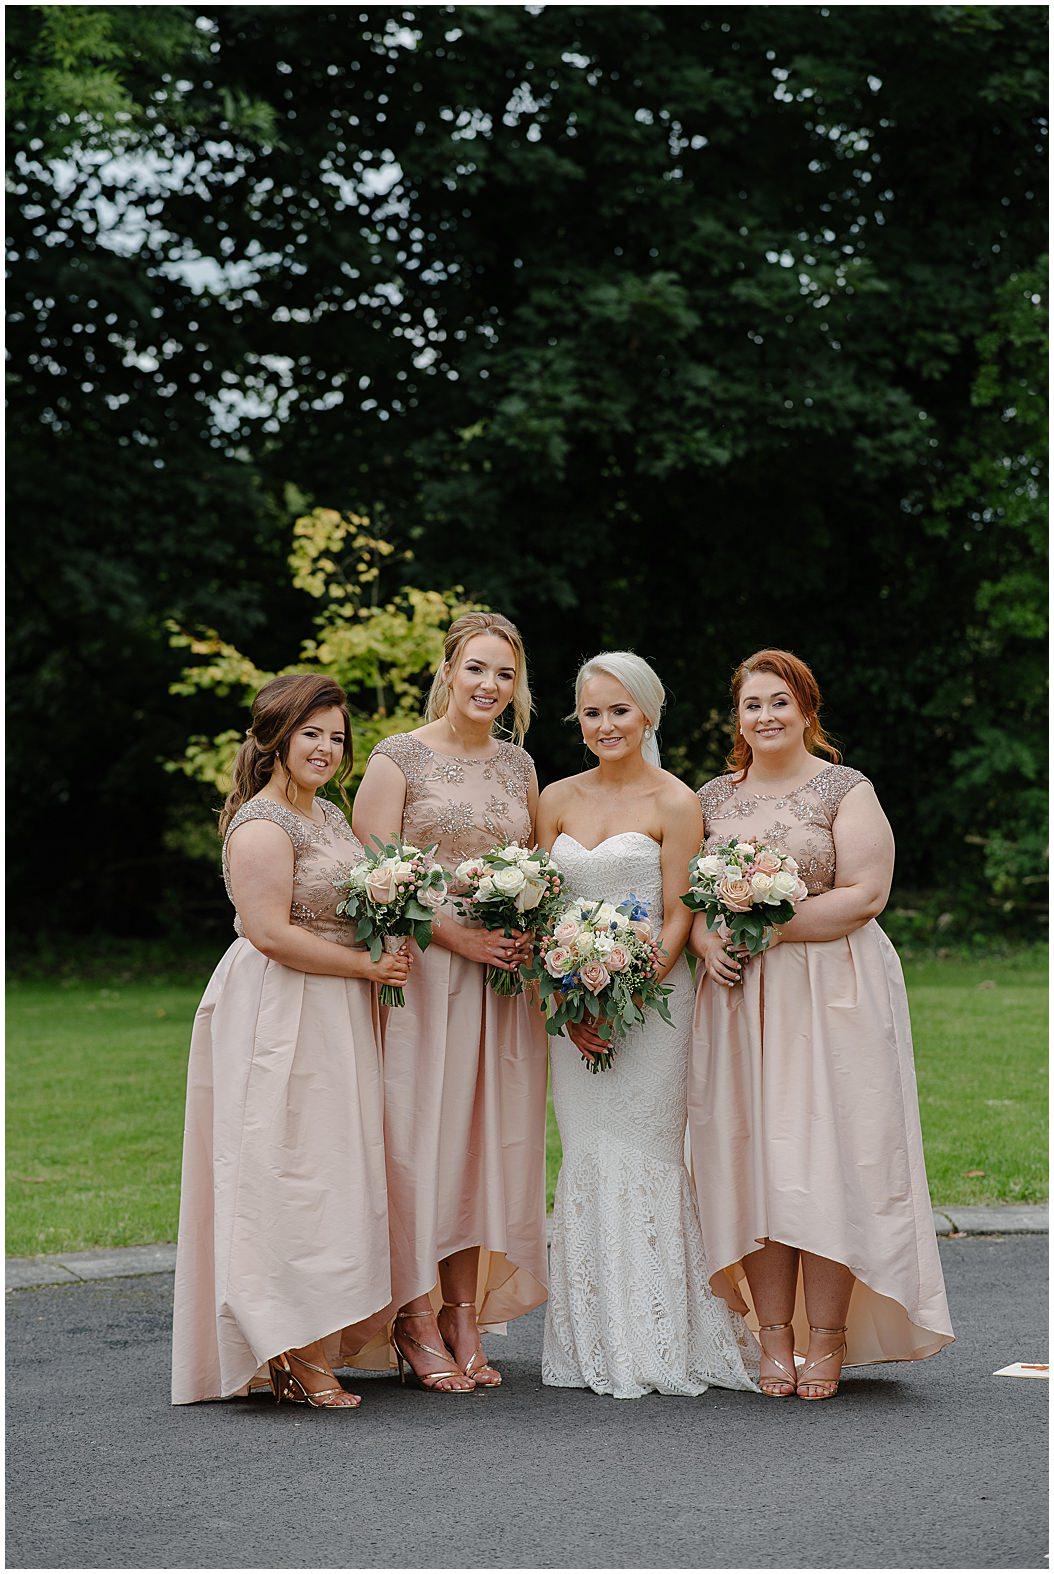 tempo-manor-wedding-jude-browne-photography_0092.jpg